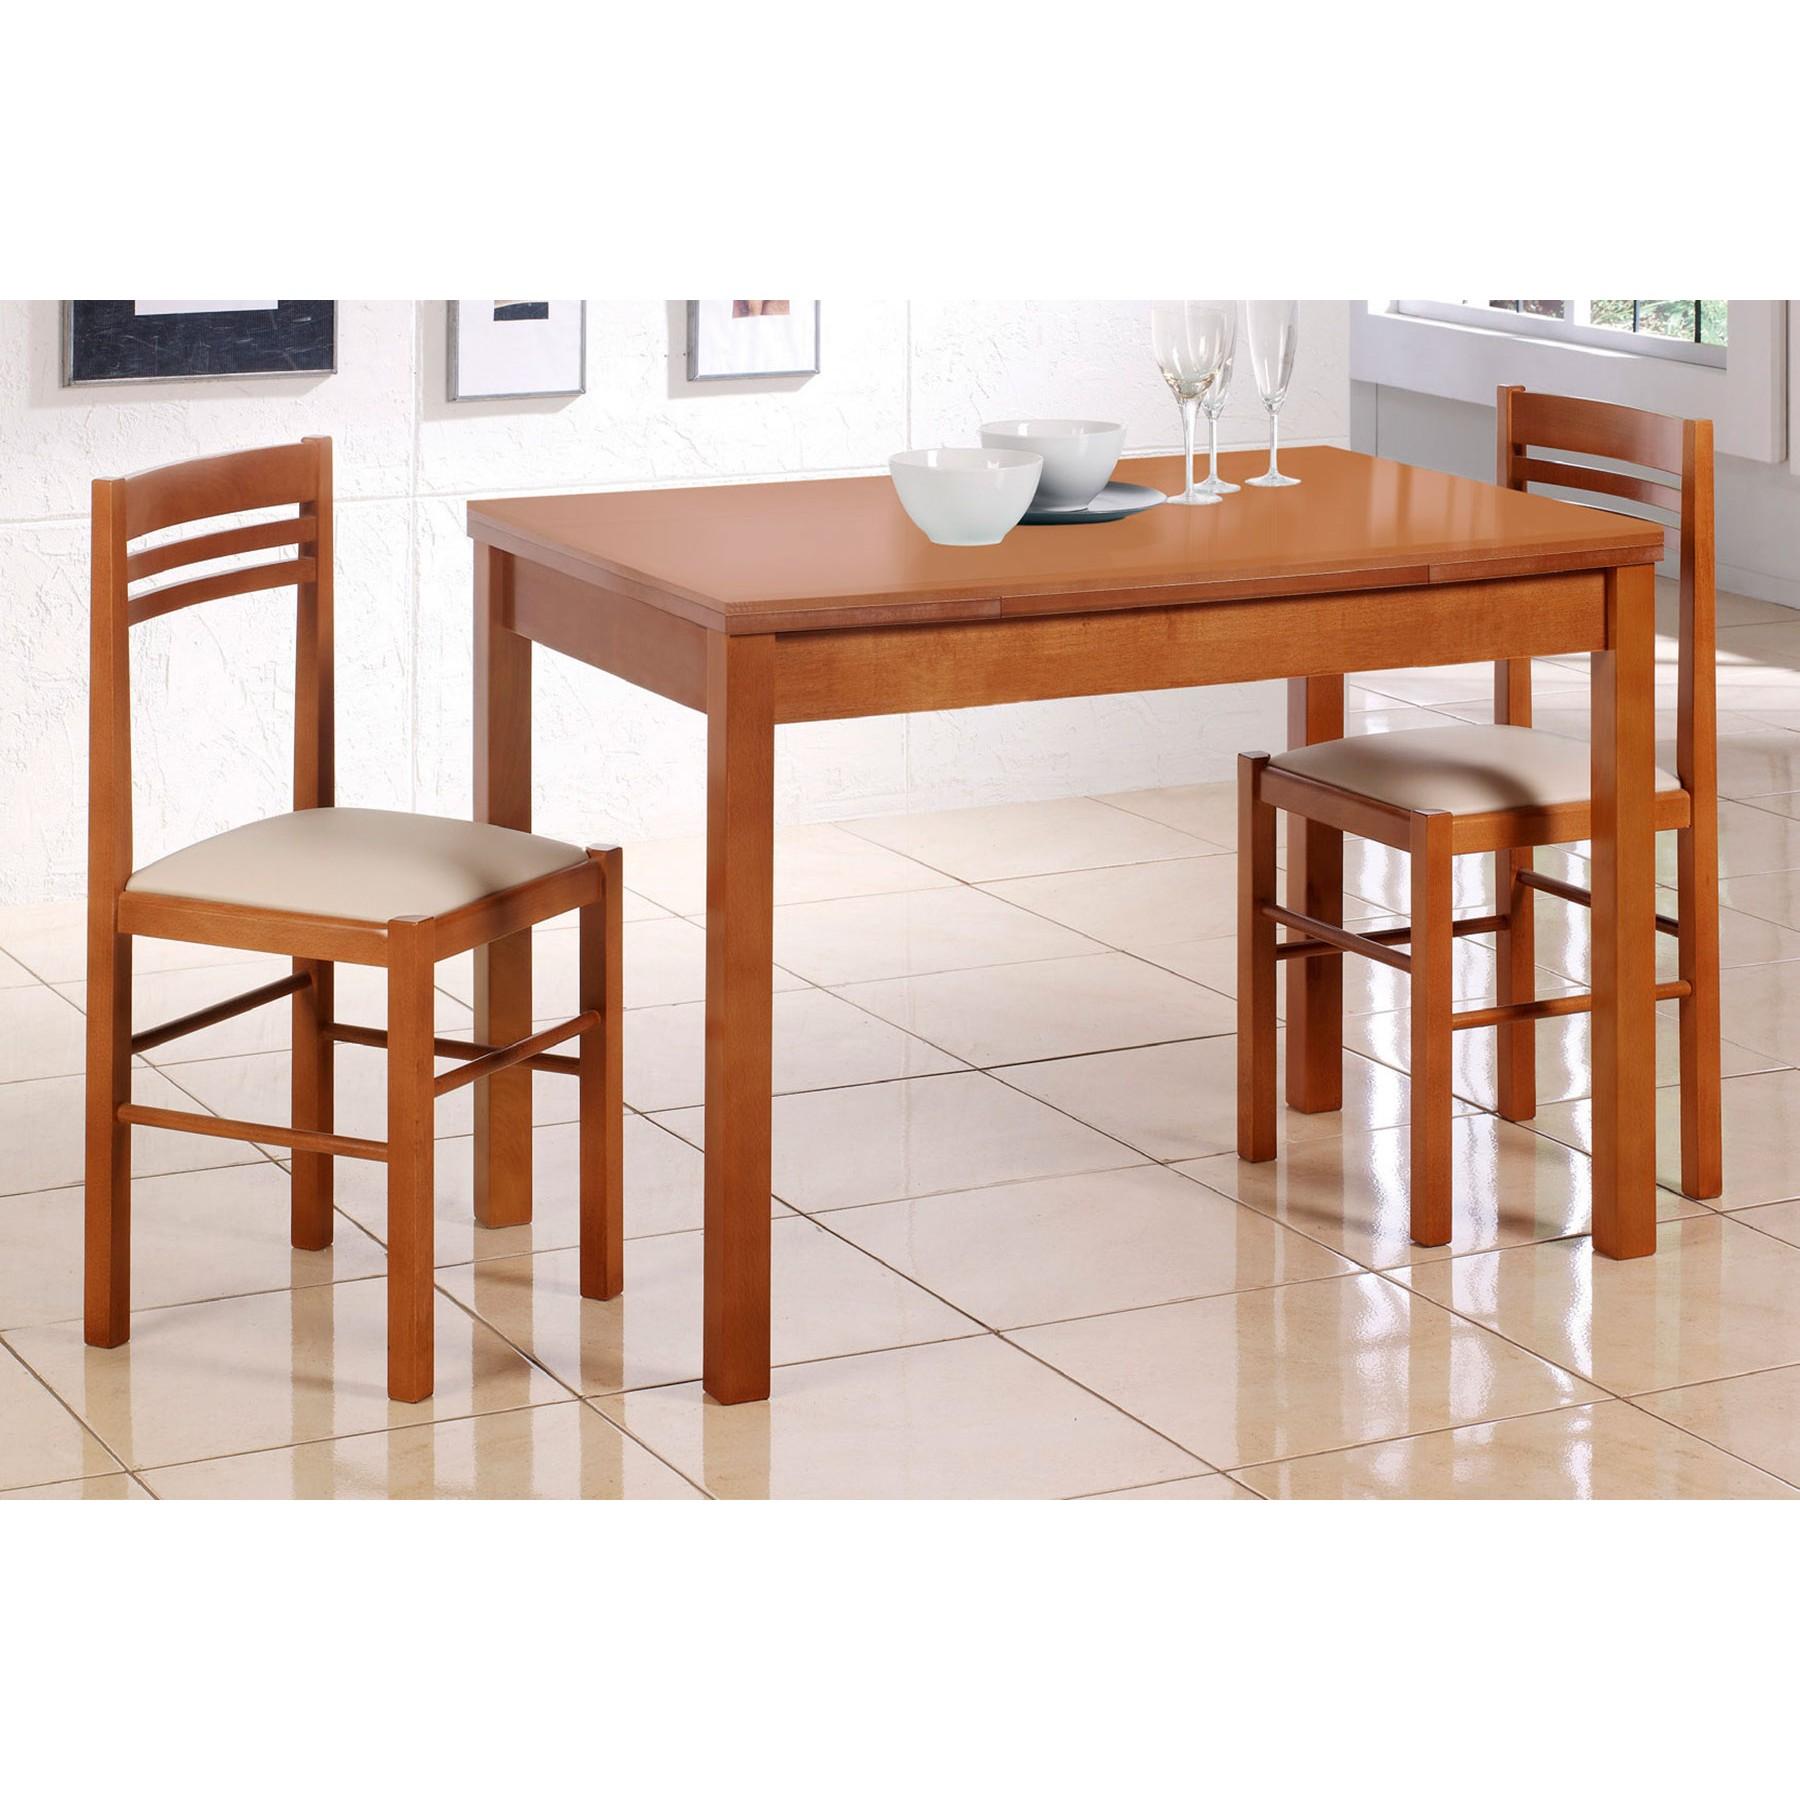 Mesa de cocina extensible en madera de cristal modelo naranja - Mesa para la cocina ...